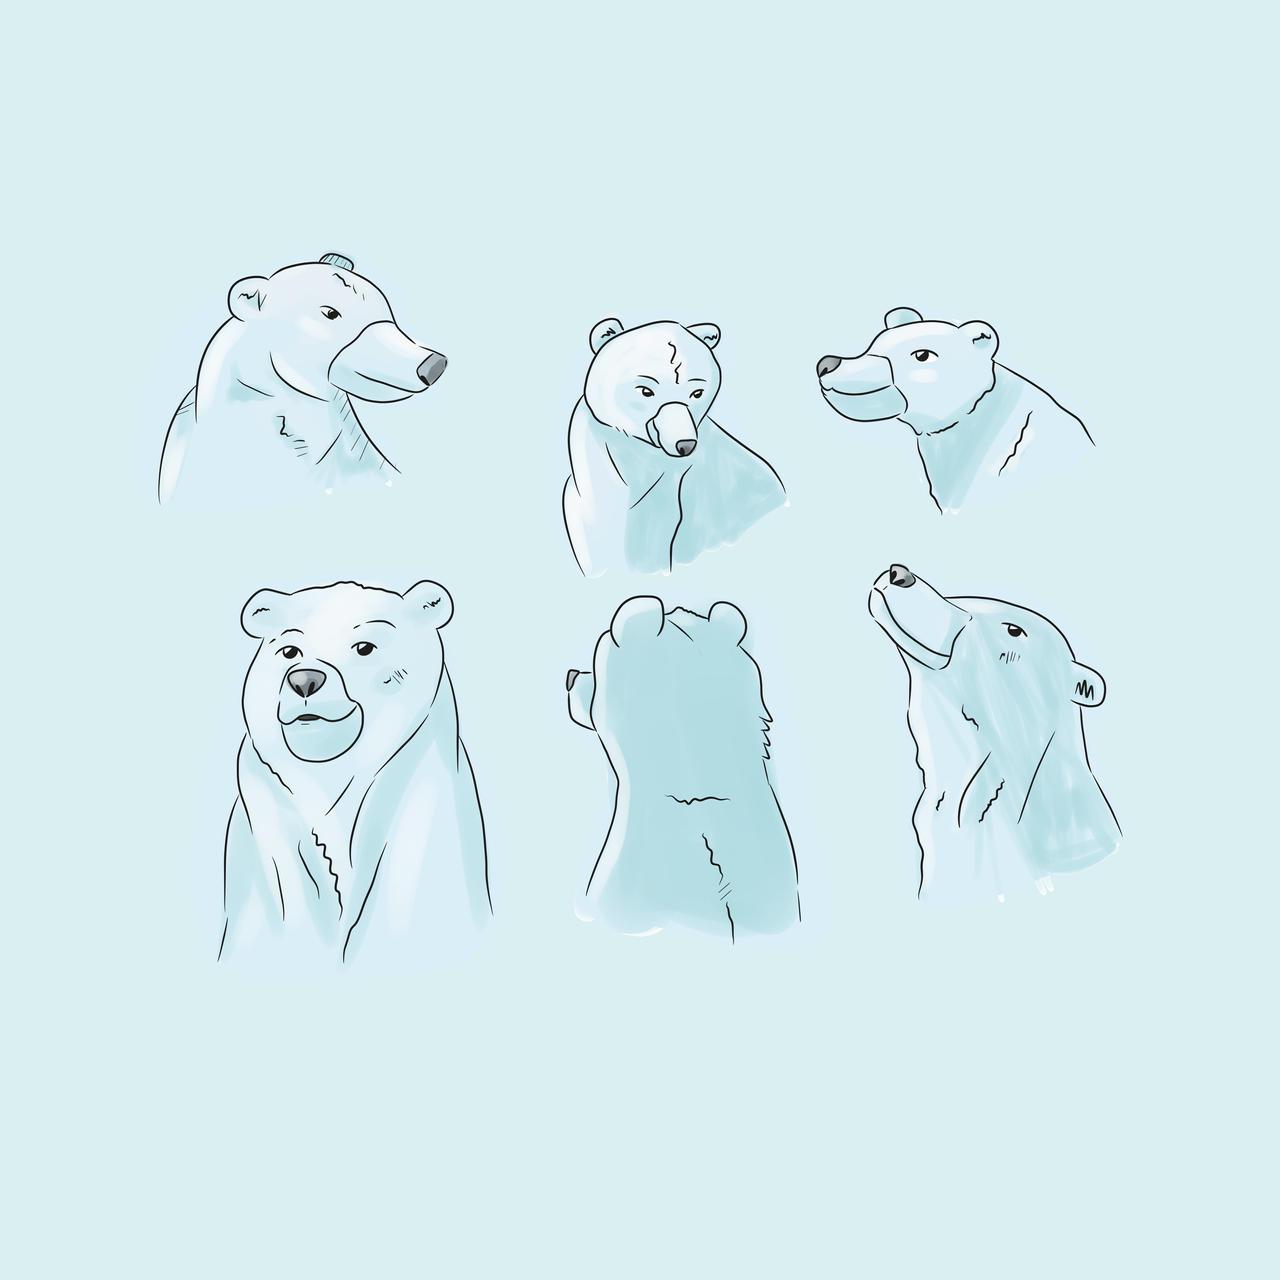 Some bear practice